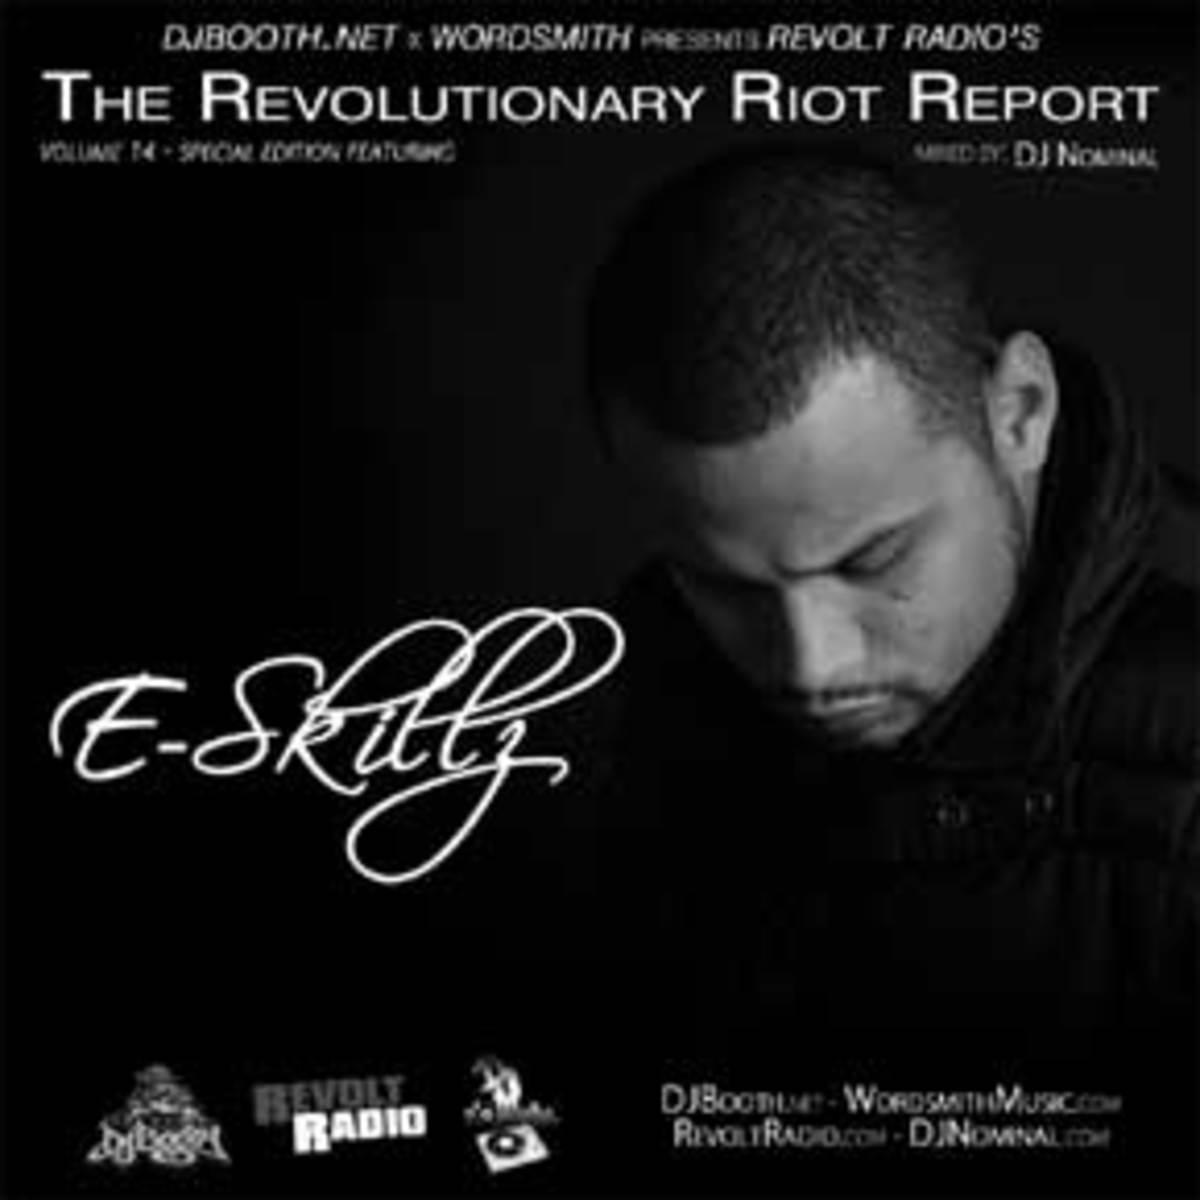 rev-riot-report-14-front.jpg